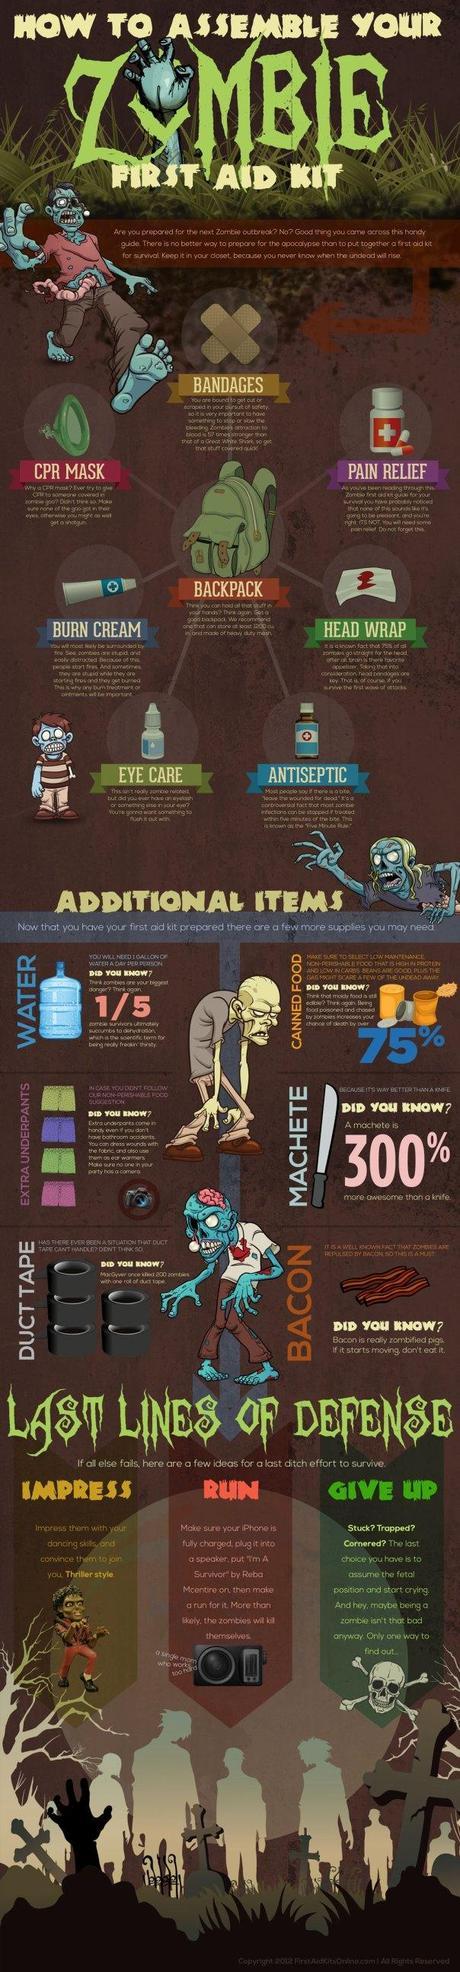 Preparing Your Zombie Apocalypse First Aid Kit